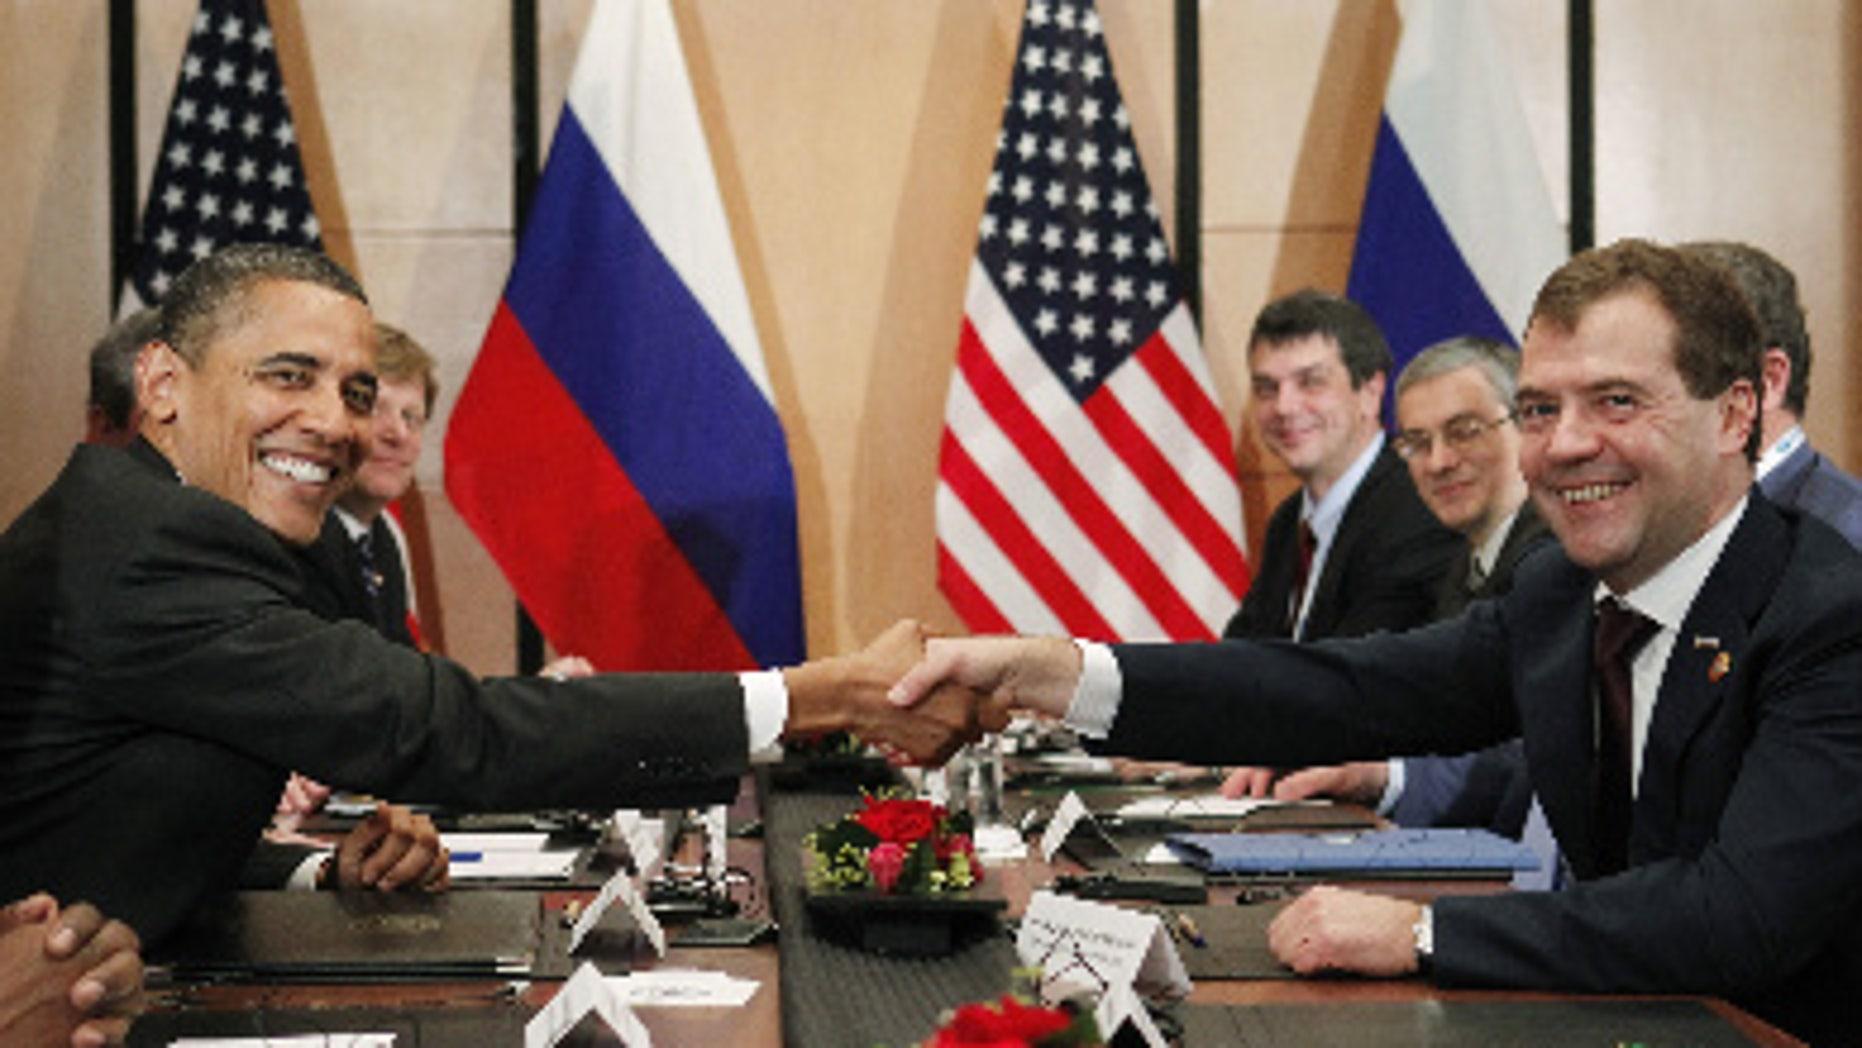 President Barack Obama and Russian President Dmitry Medvedev meet in Japan ahead of next week's NATO summit in Portugal. (AP Photo)